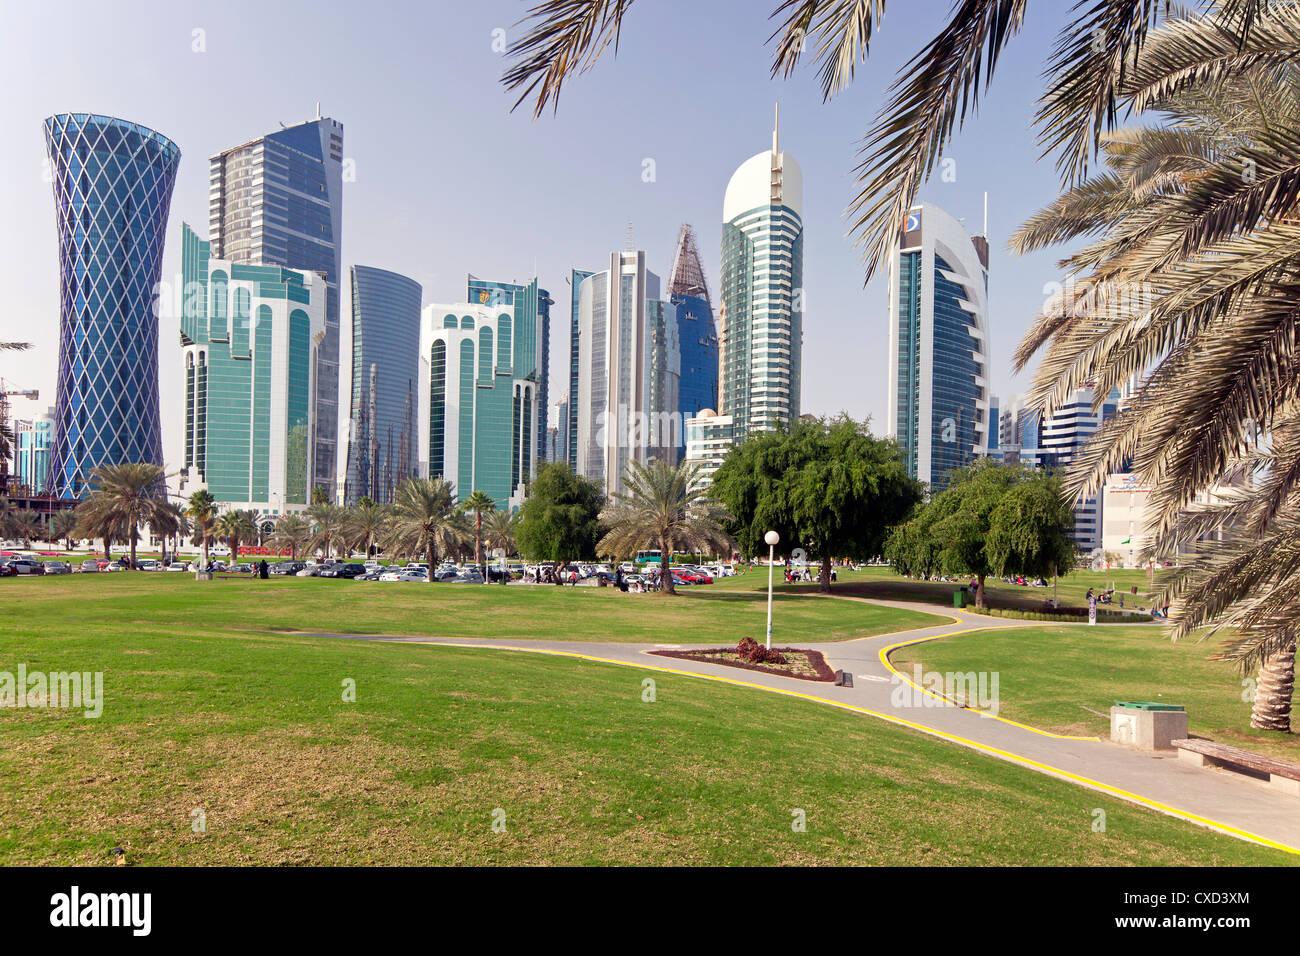 Skyline moderne du quartier financier central West Bay, Doha, Qatar, Moyen-Orient Photo Stock